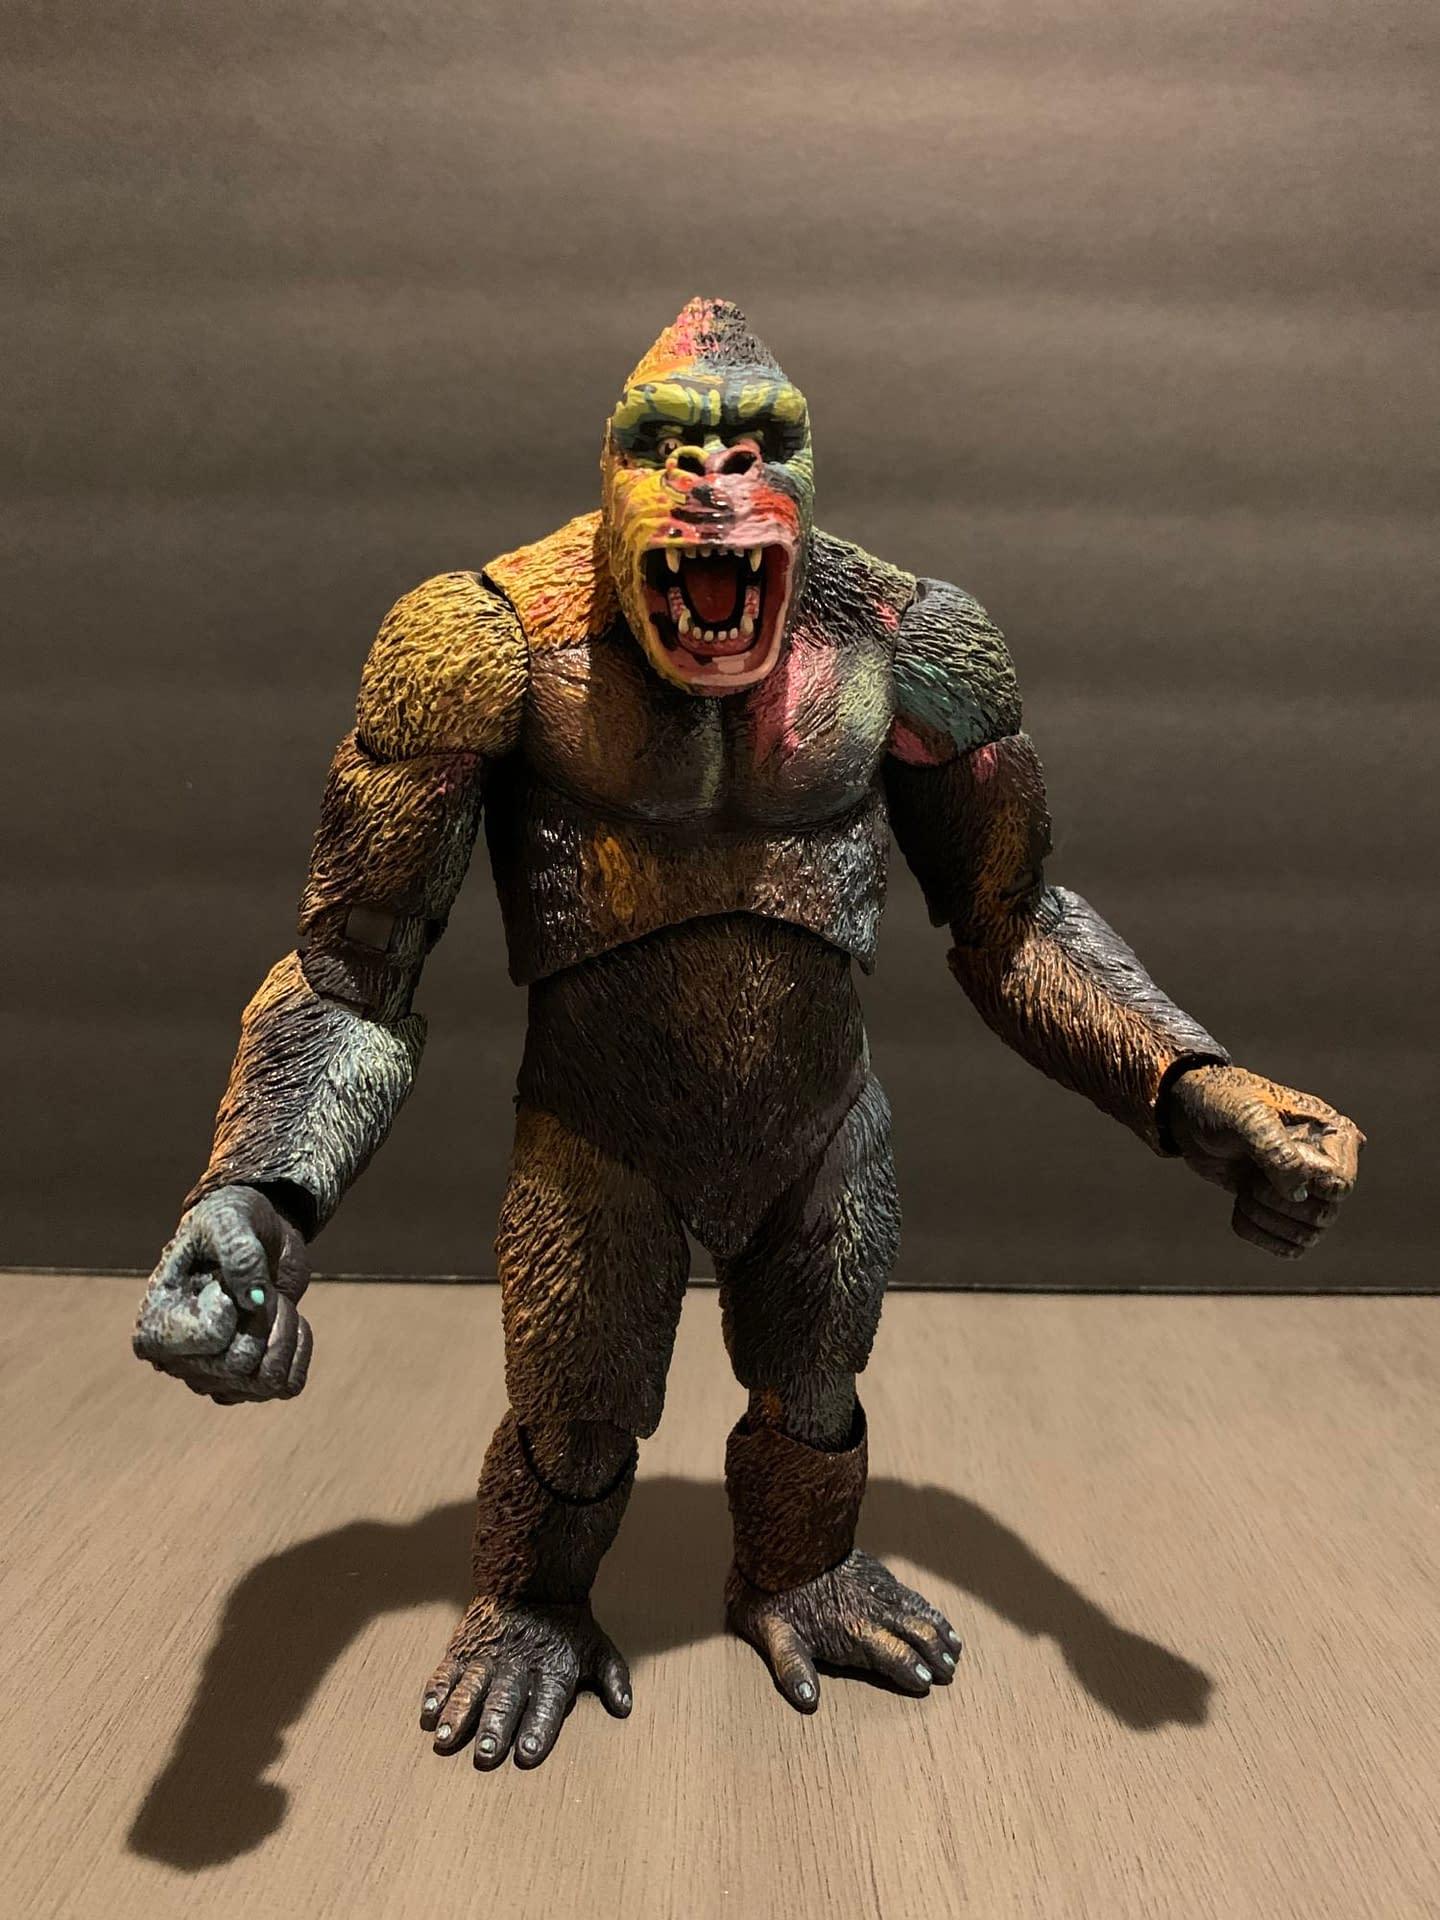 NECA's New Kong Figure Is